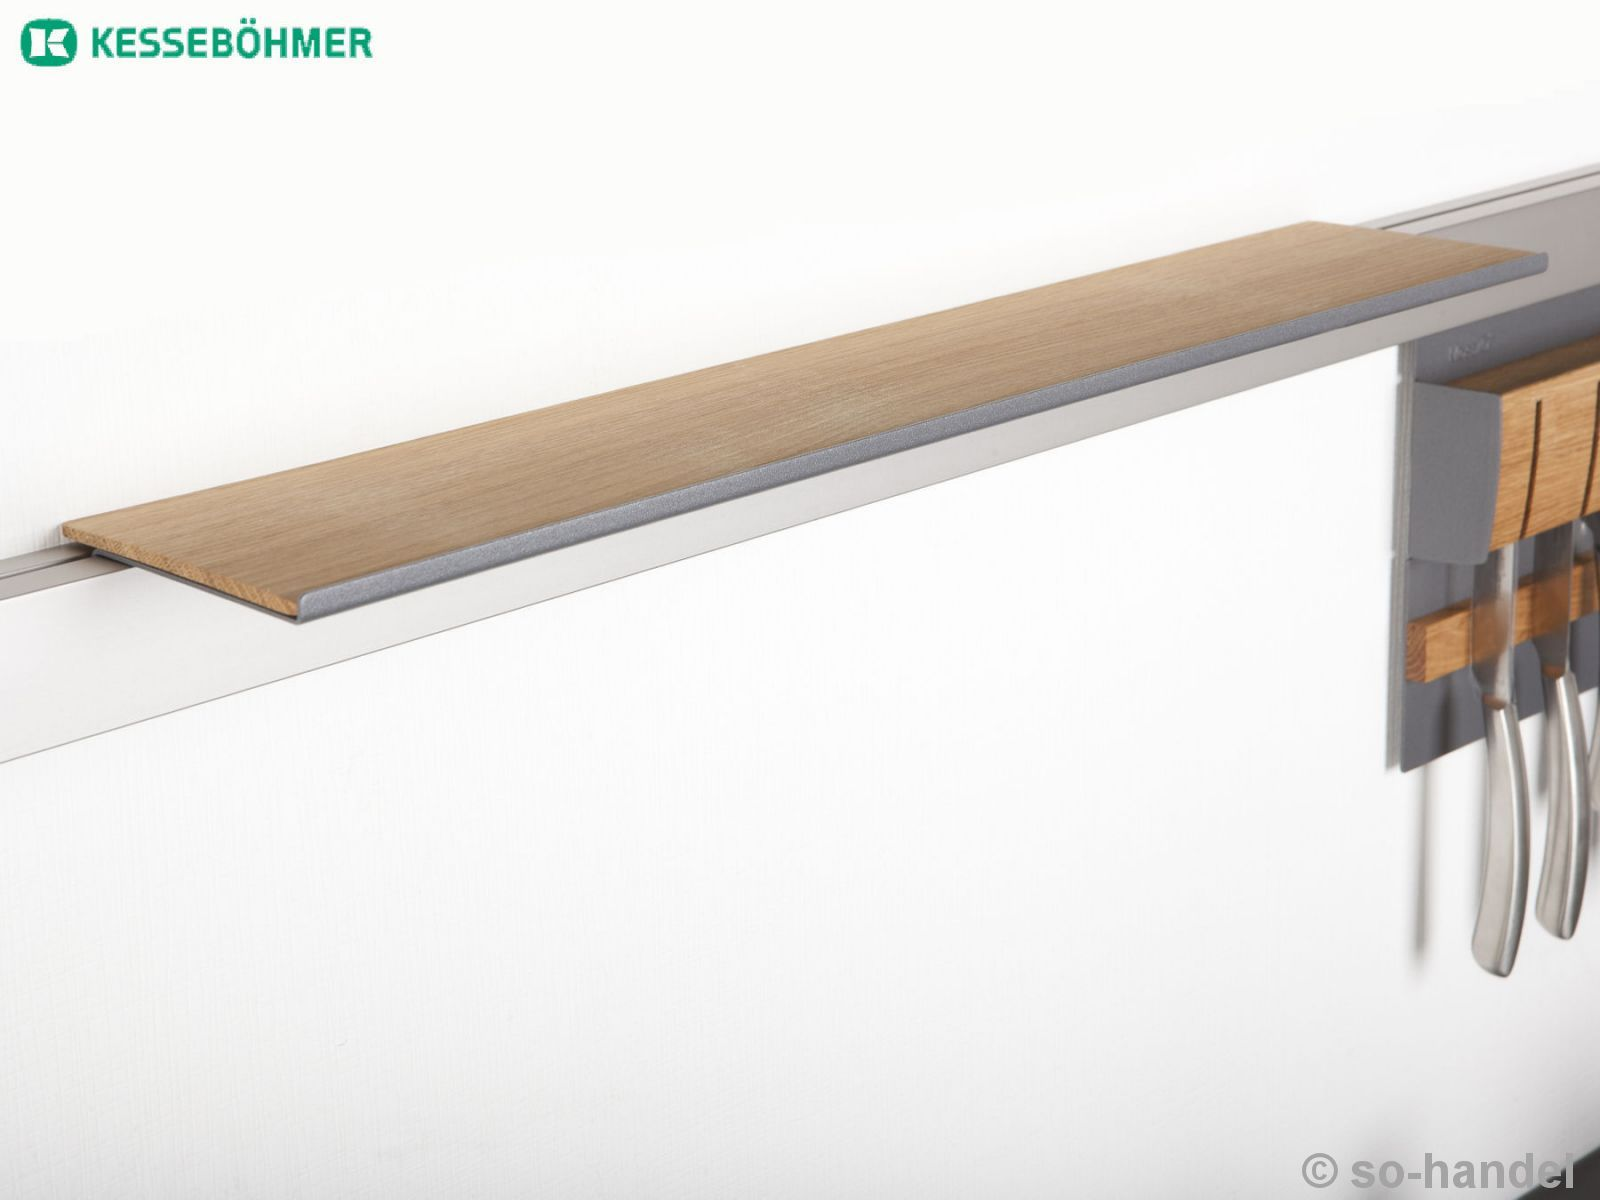 Kessebohmer linero mosaiq deko einleger deko einleger for Küchen relingsystem